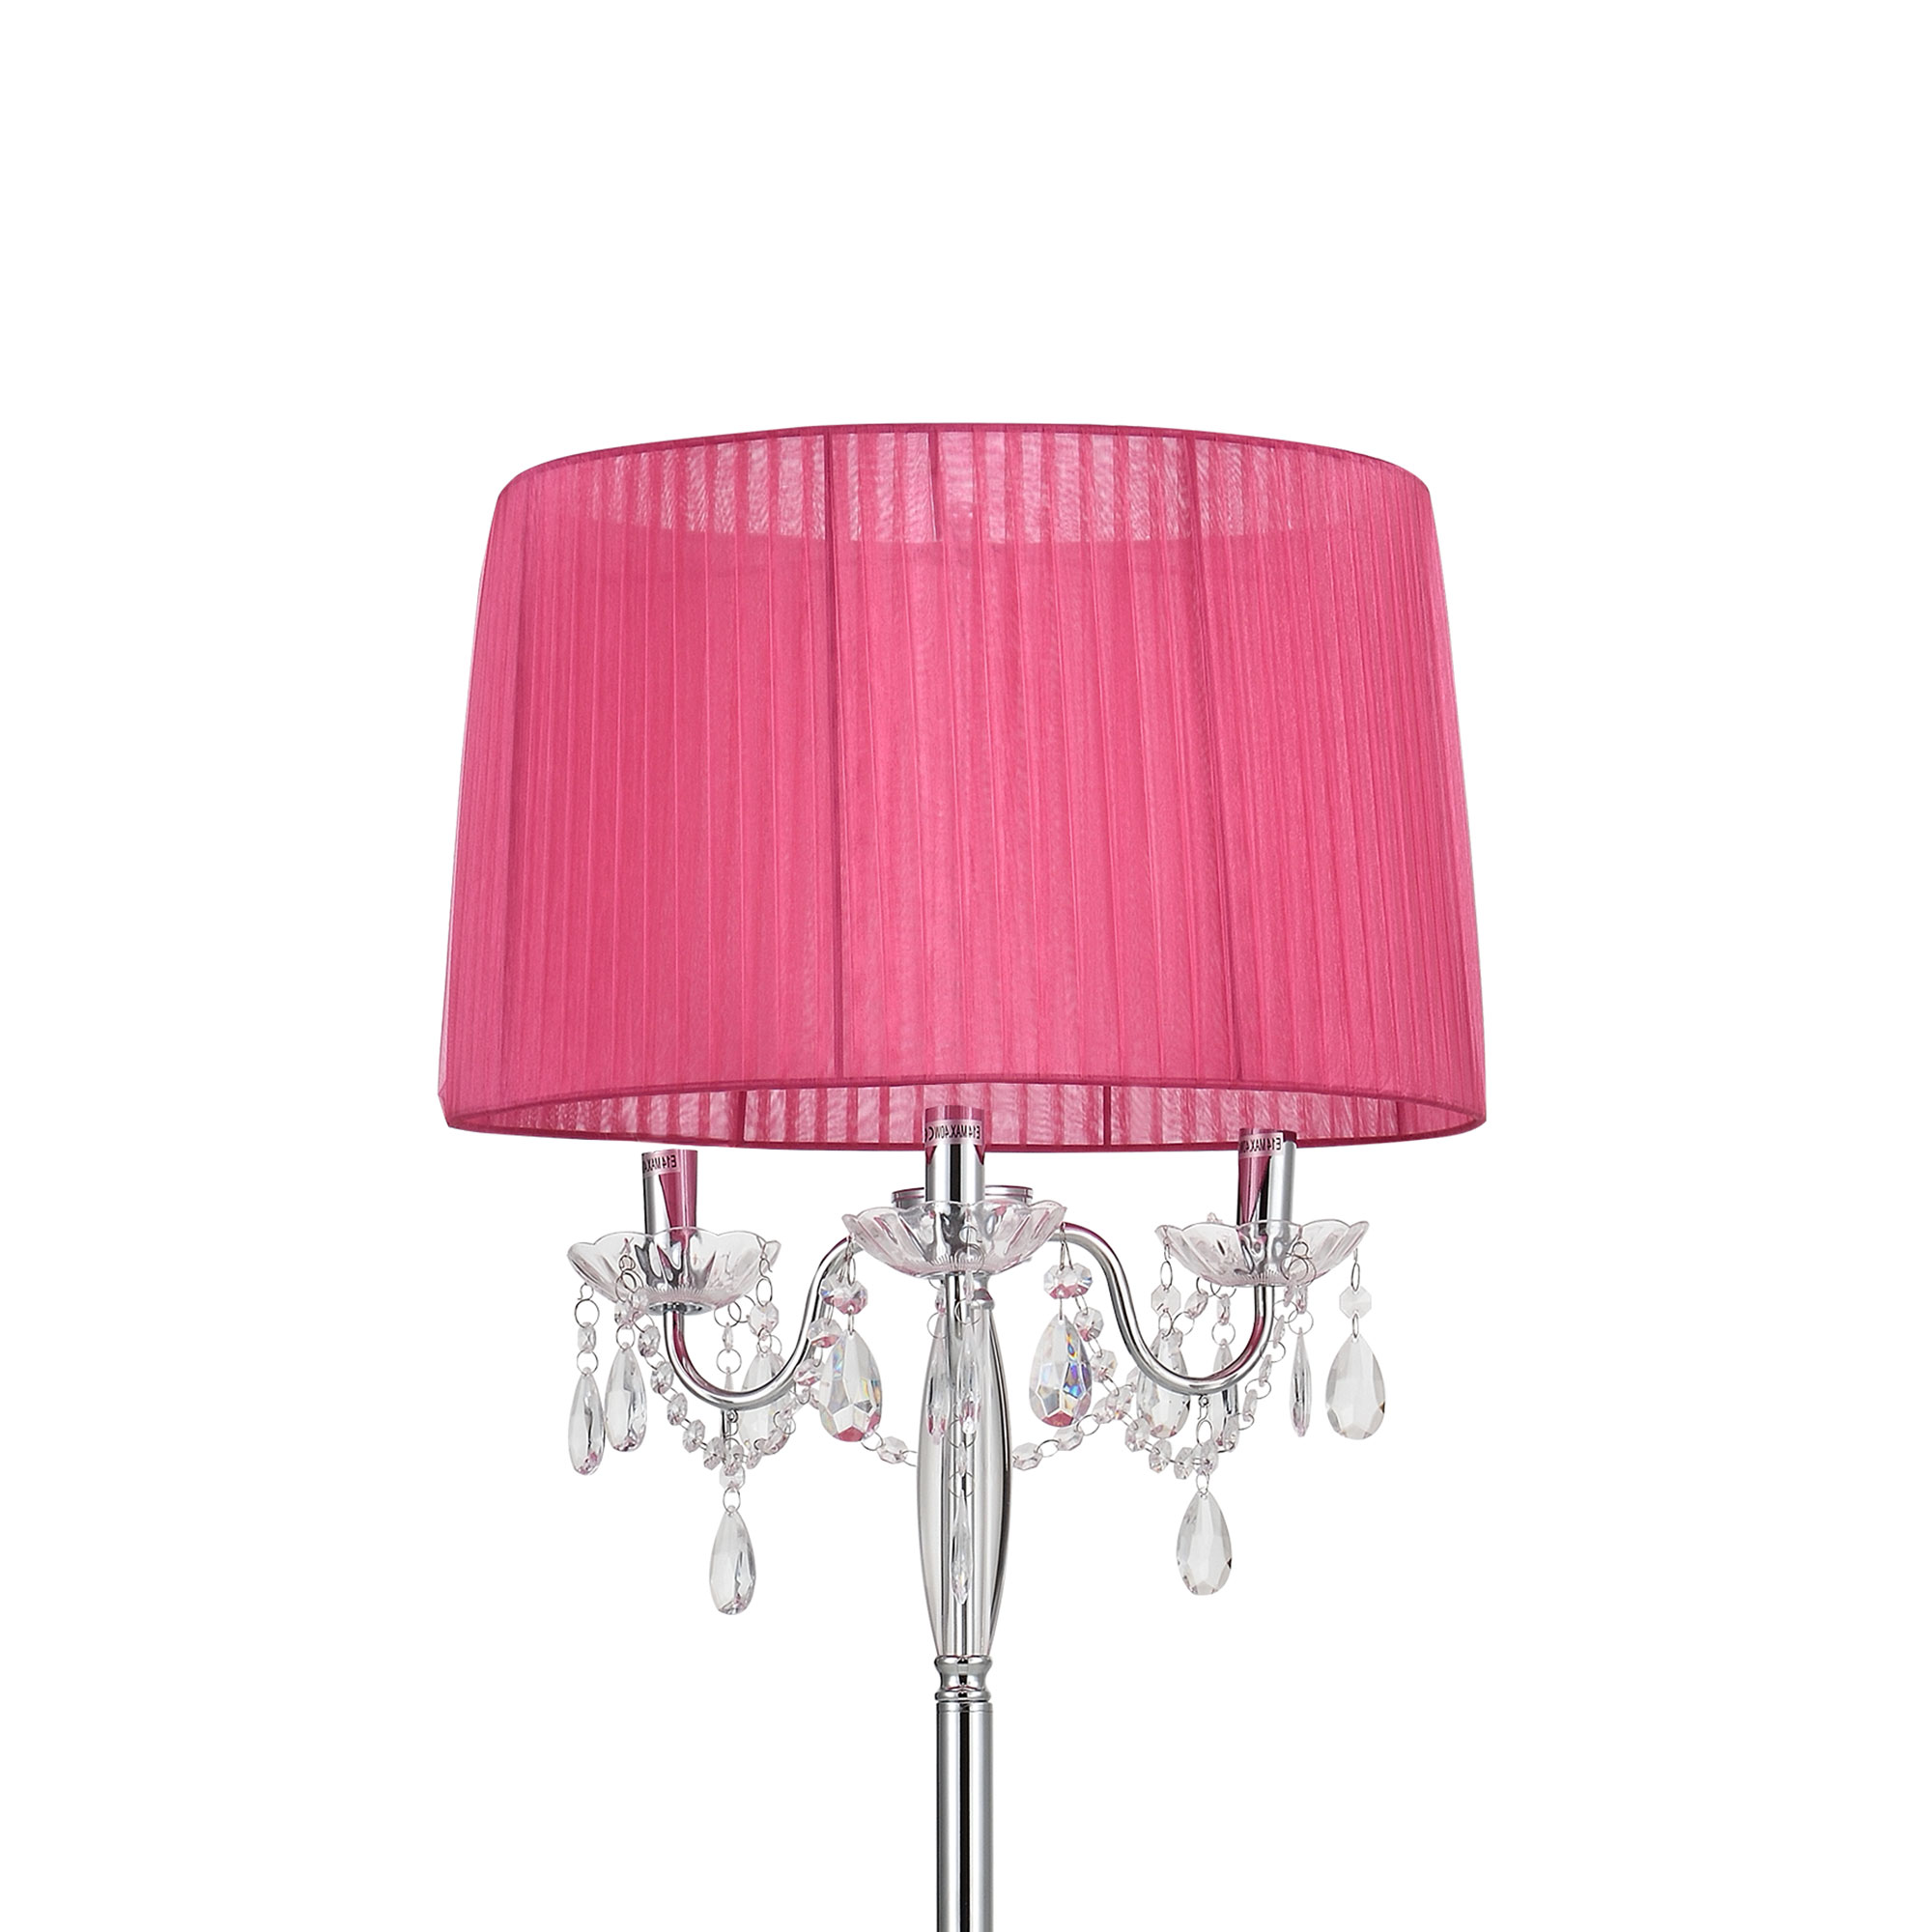 lux.pro]® luce a stelo lampada a stelo da soggiorno luce lampada ... - Soggiorno Fucsia 2